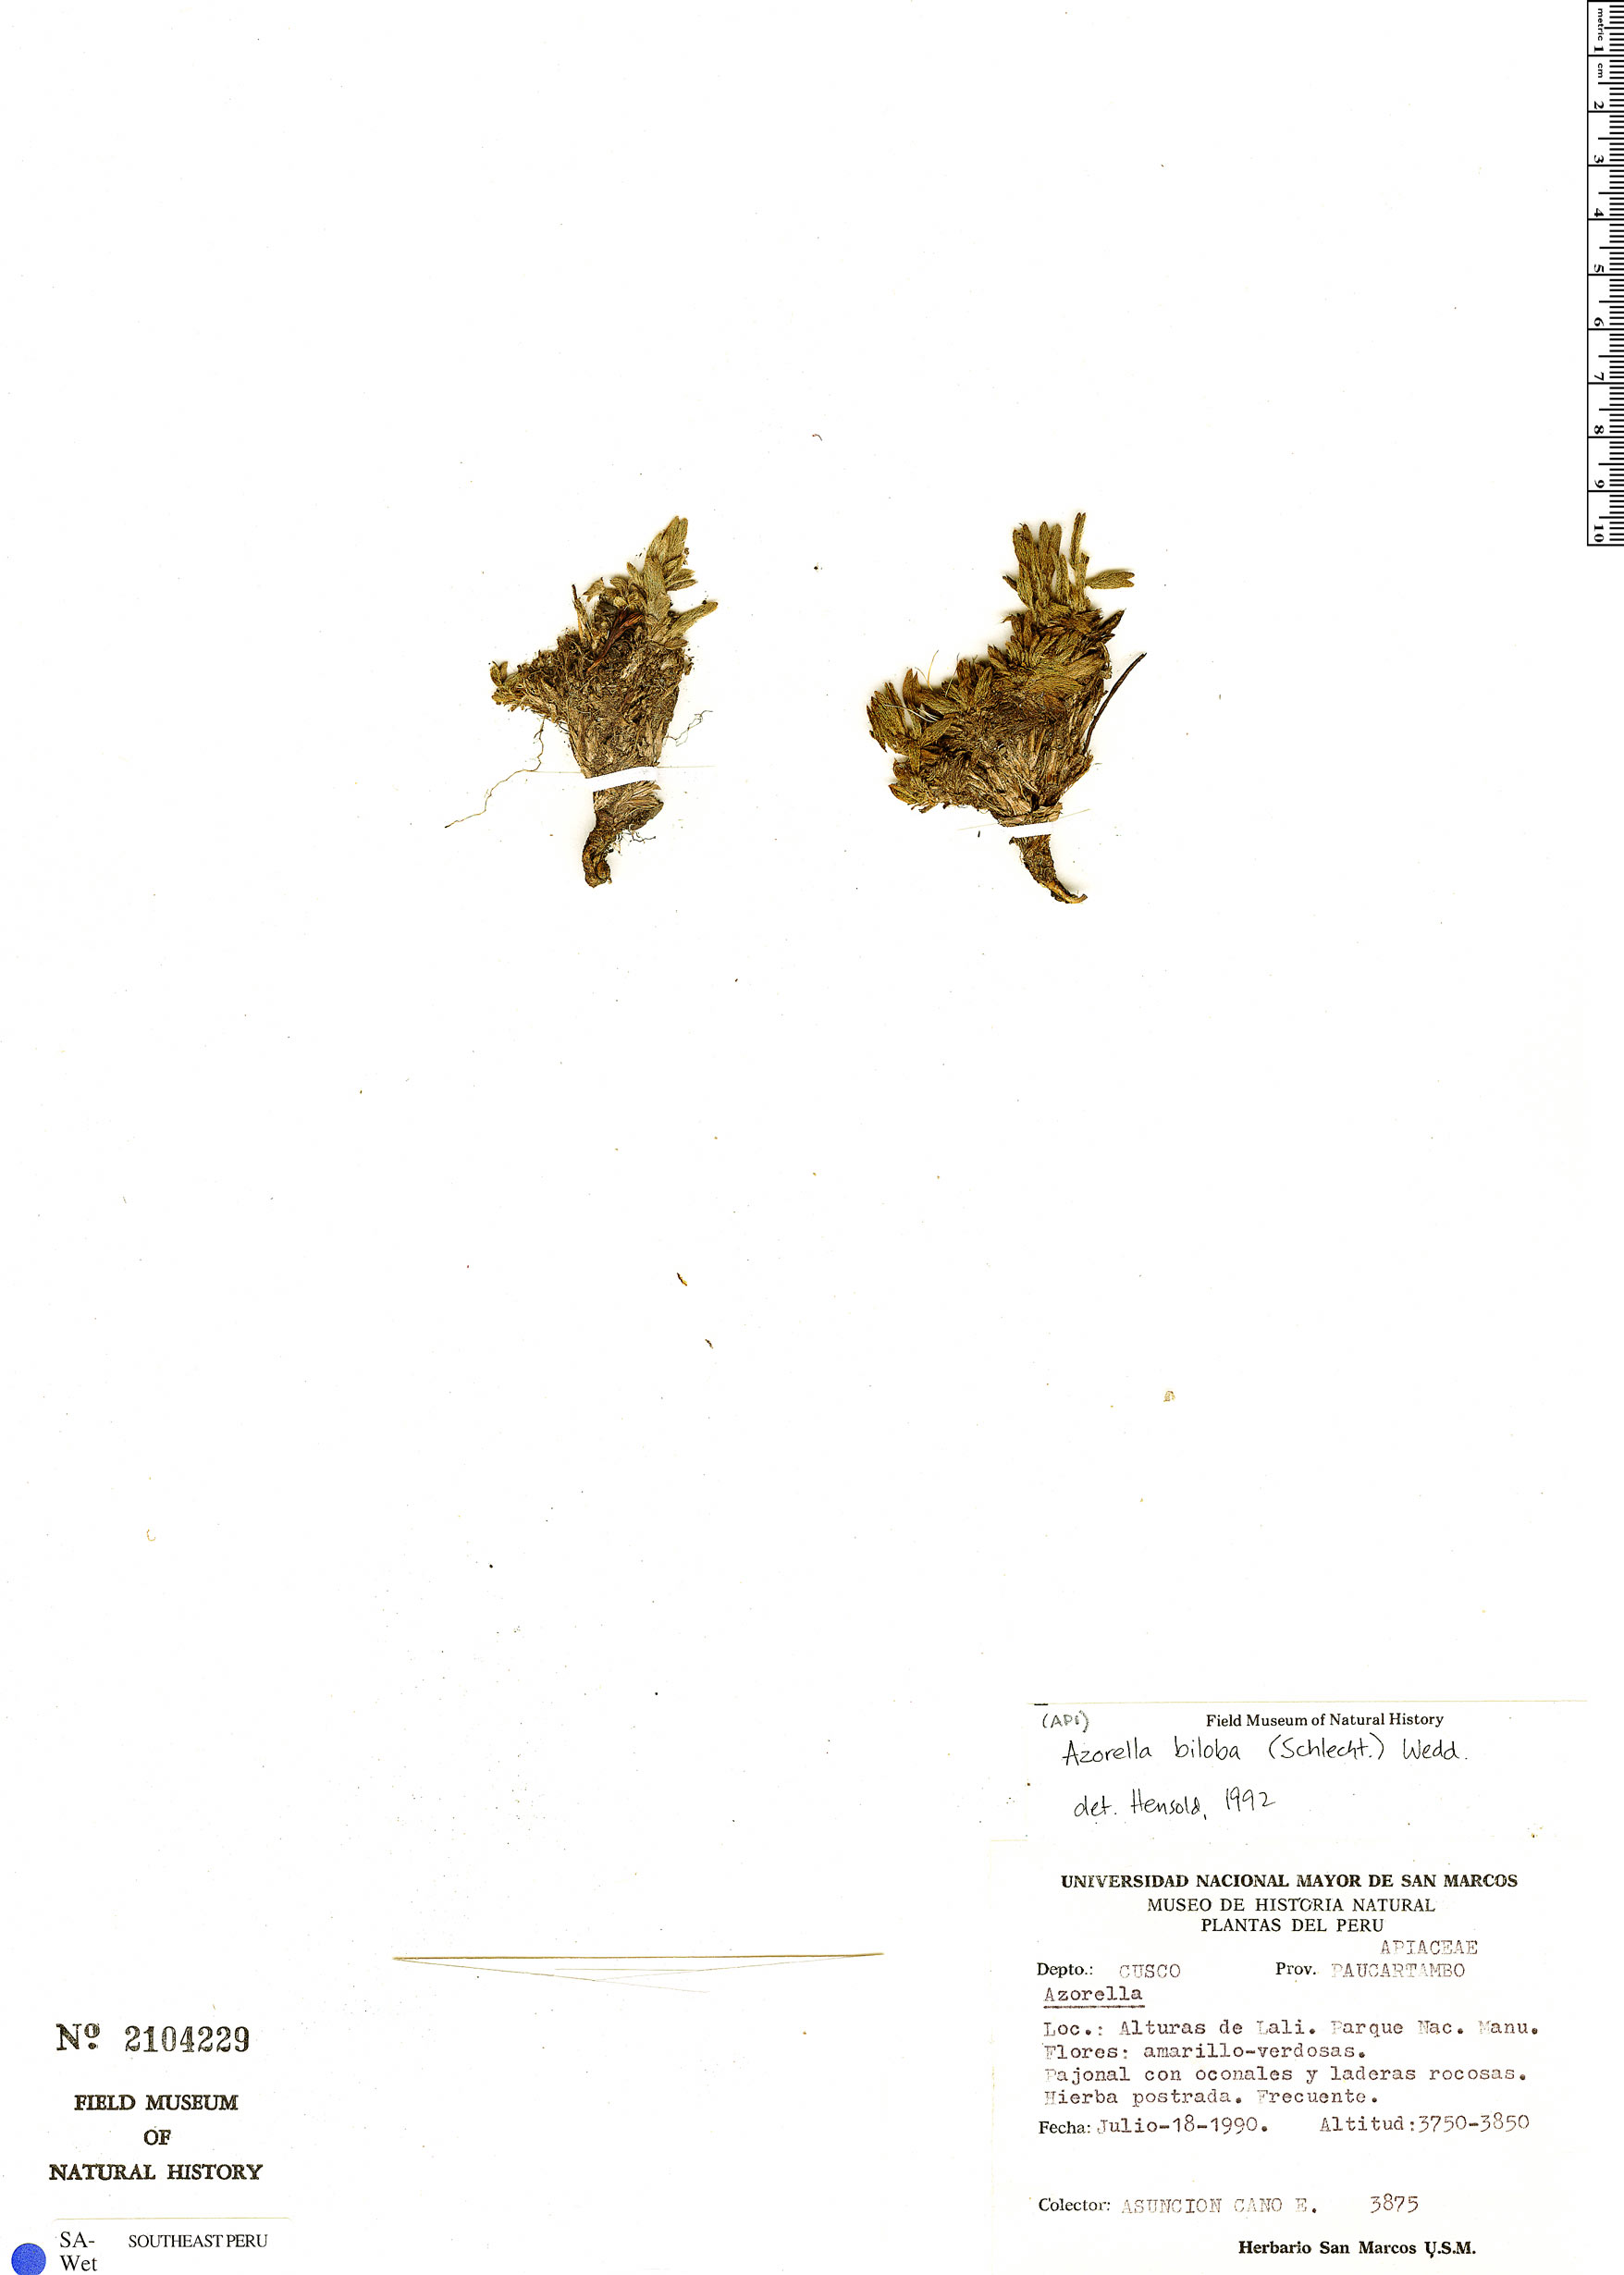 Azorella biloba image